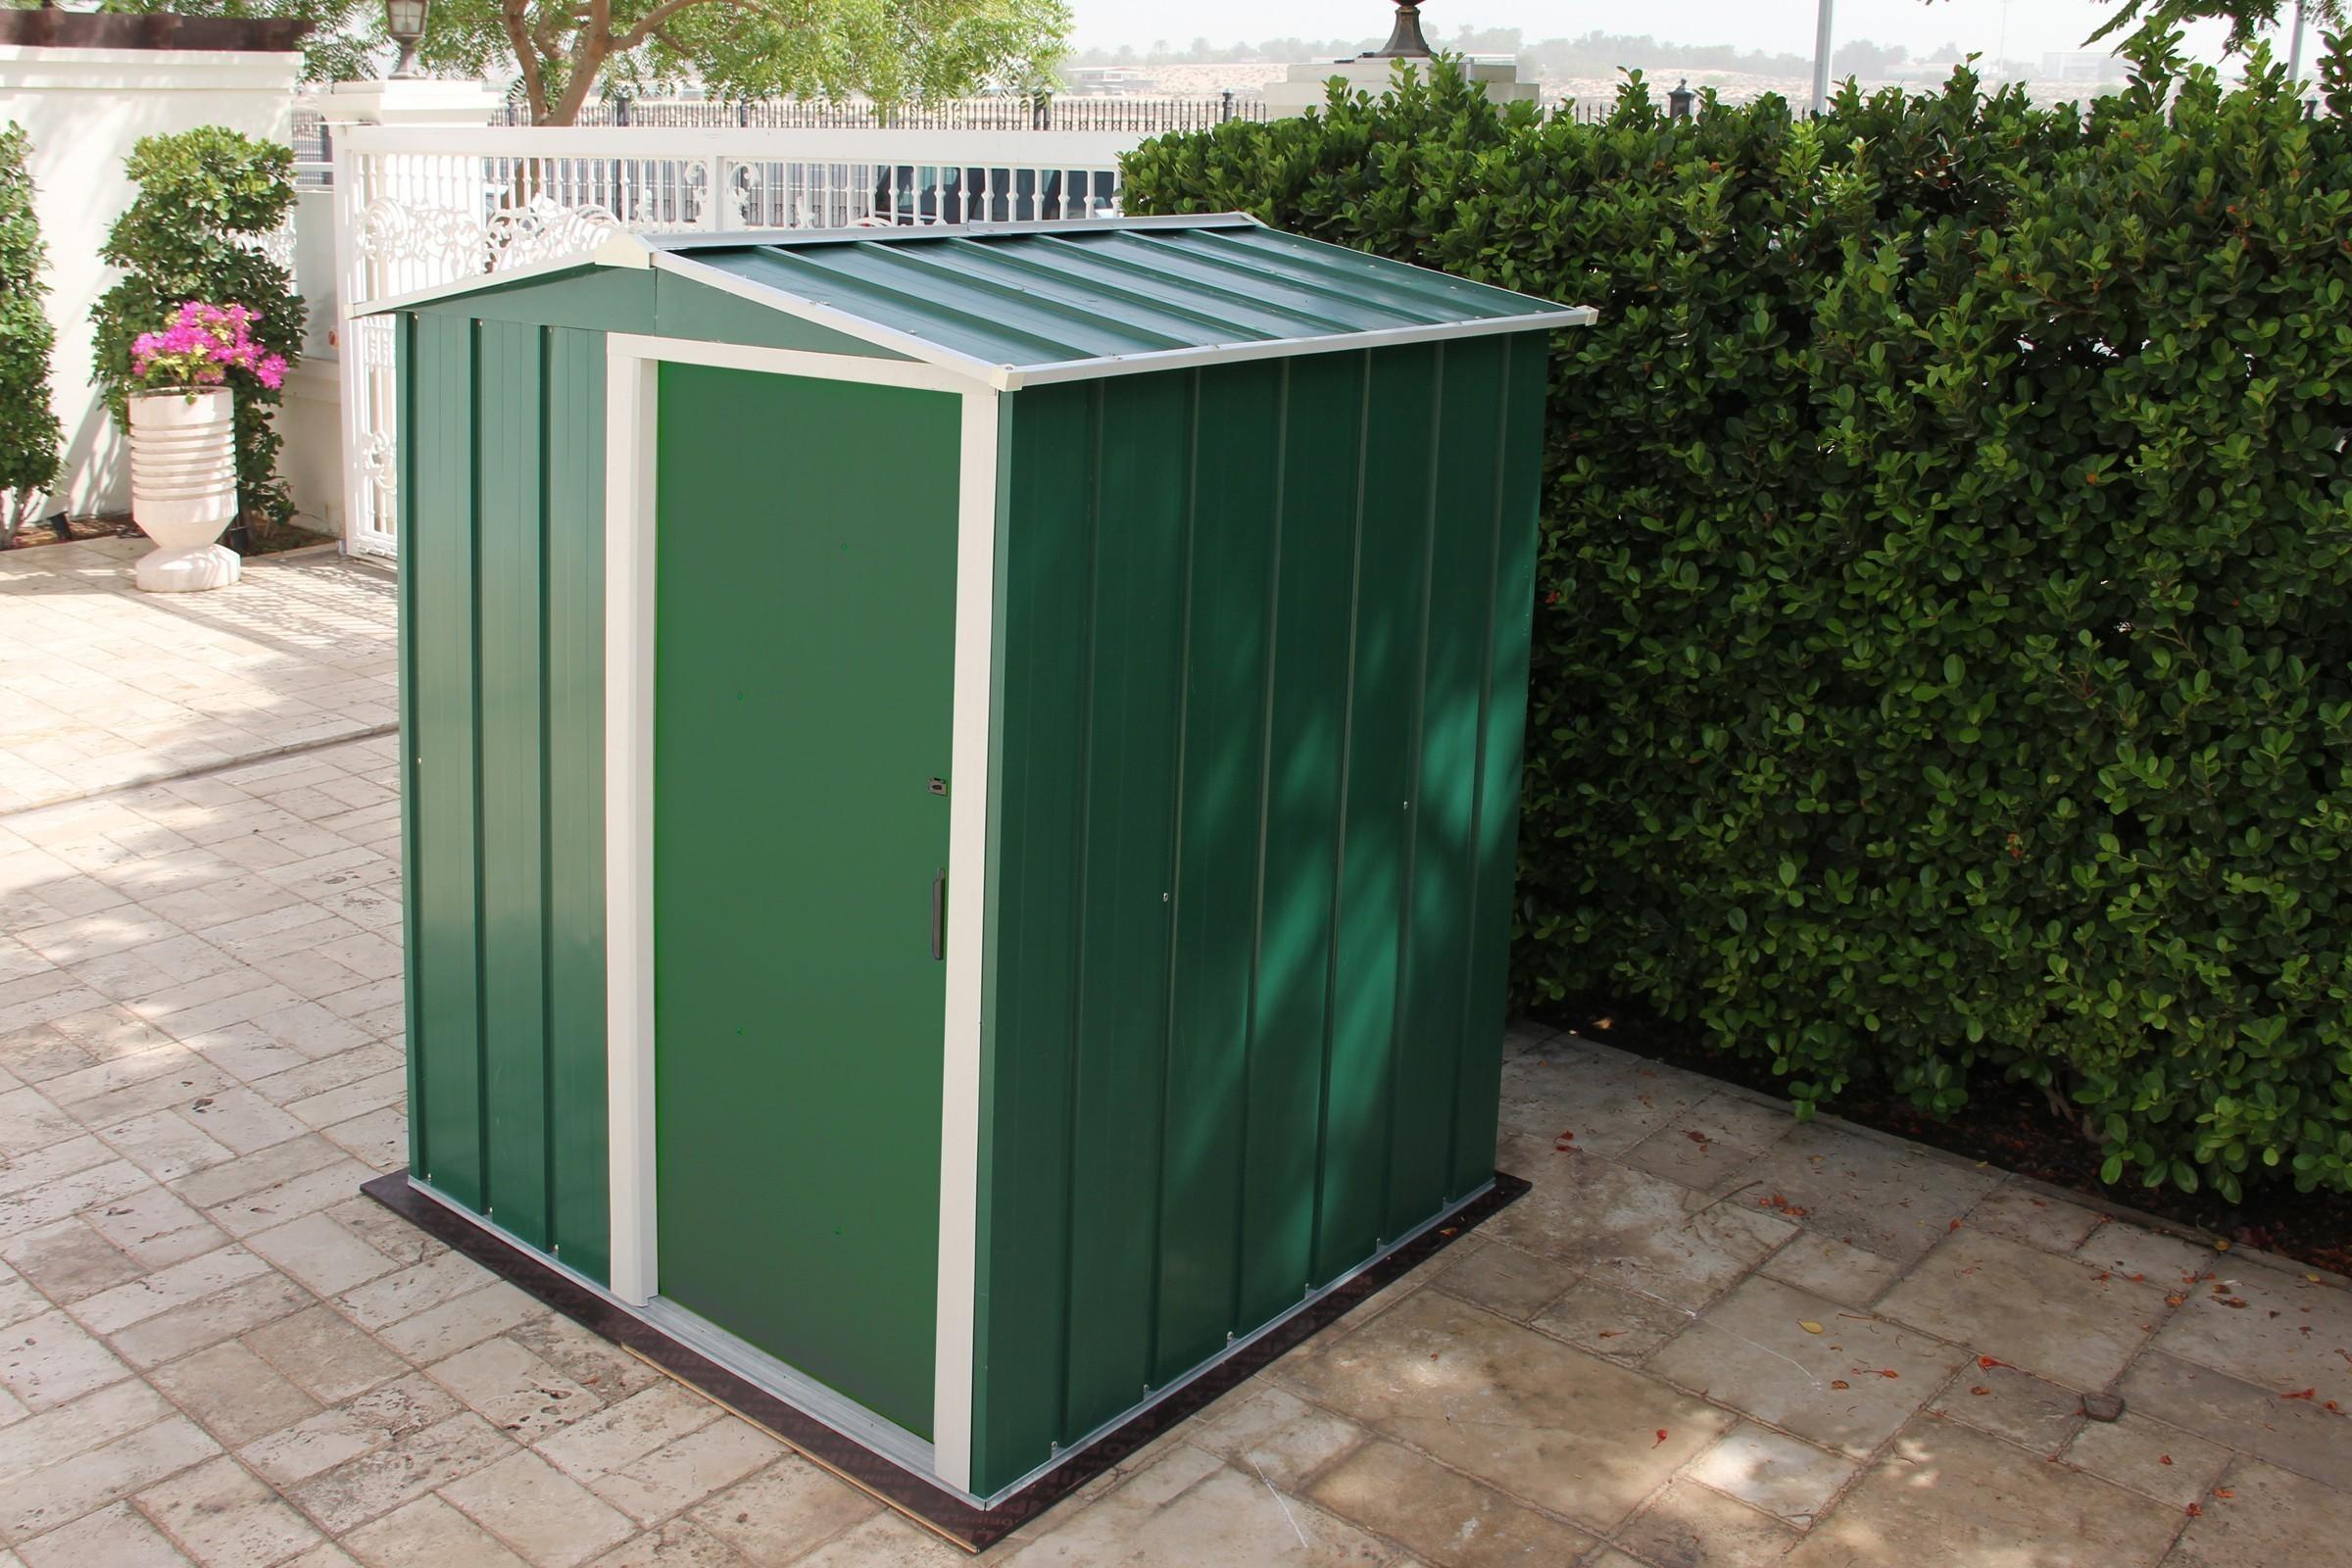 duramax ger tehaus metall eco 5x4 gr n 162x122 cm bei. Black Bedroom Furniture Sets. Home Design Ideas